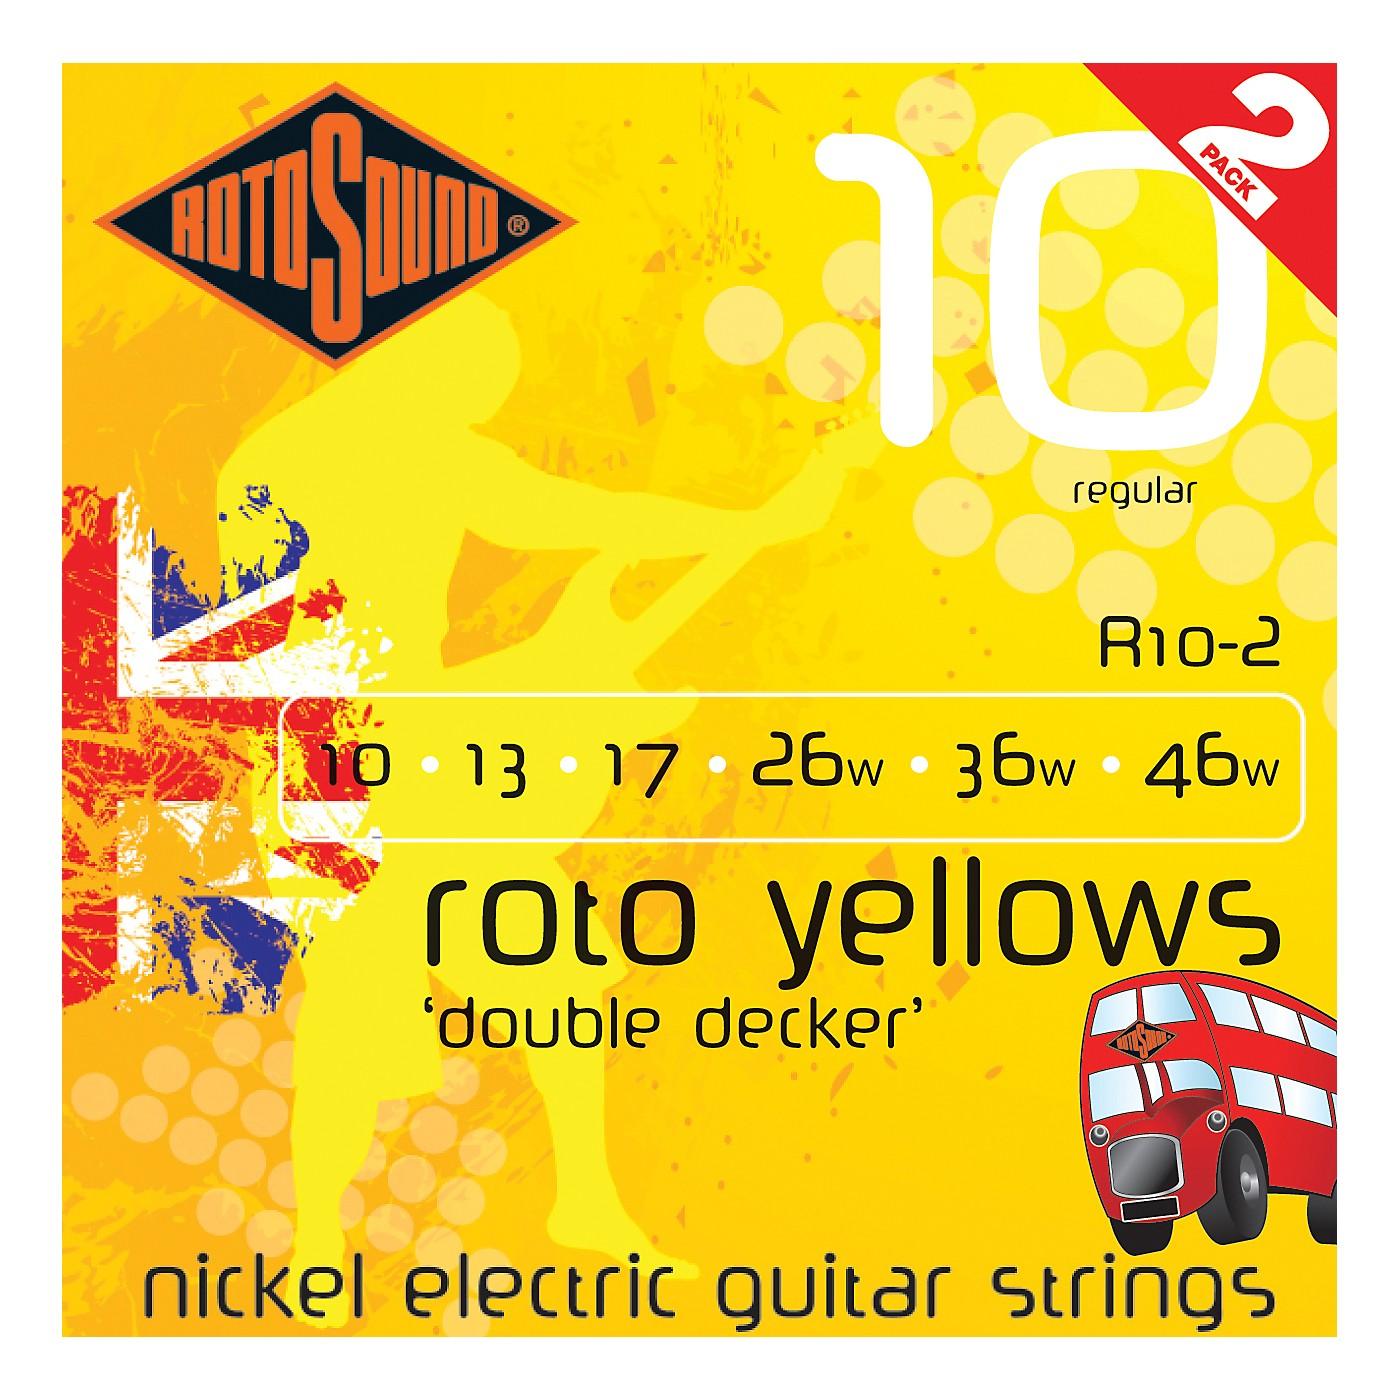 Rotosound Roto Yellows Double Deckers 2-Pack thumbnail